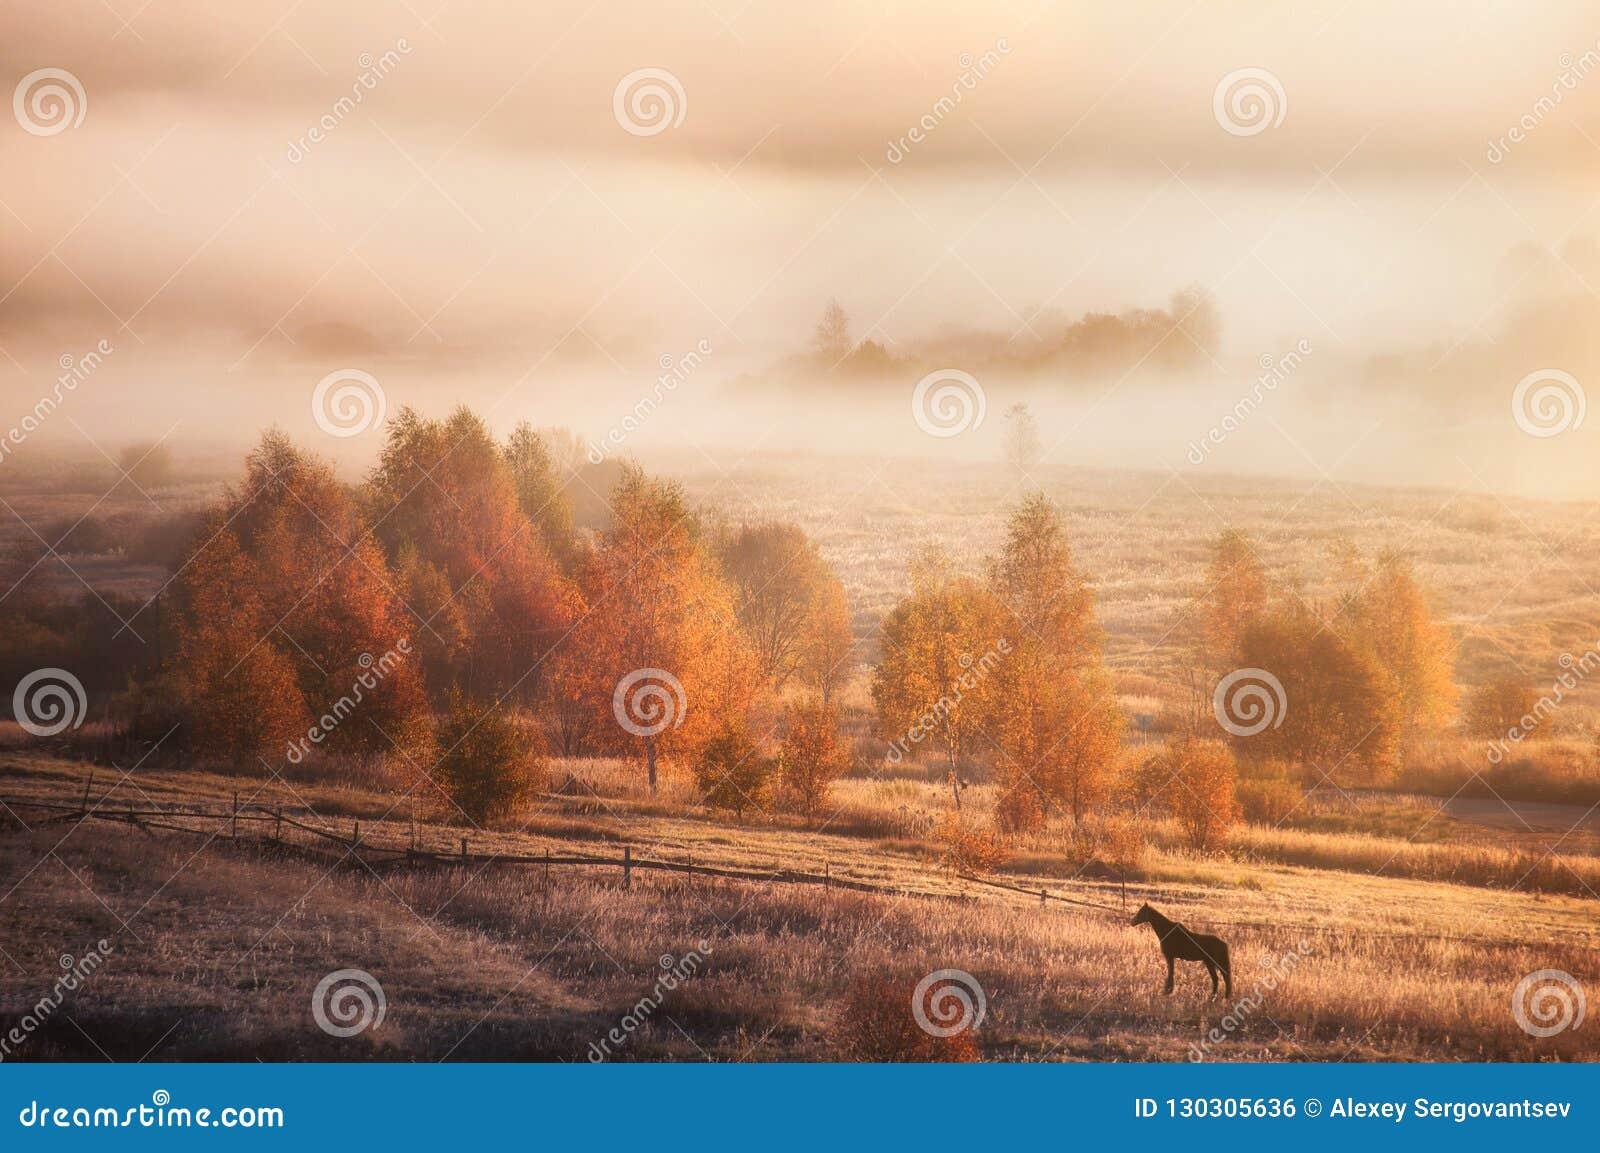 Autumn landscape in Russia. Morning nature